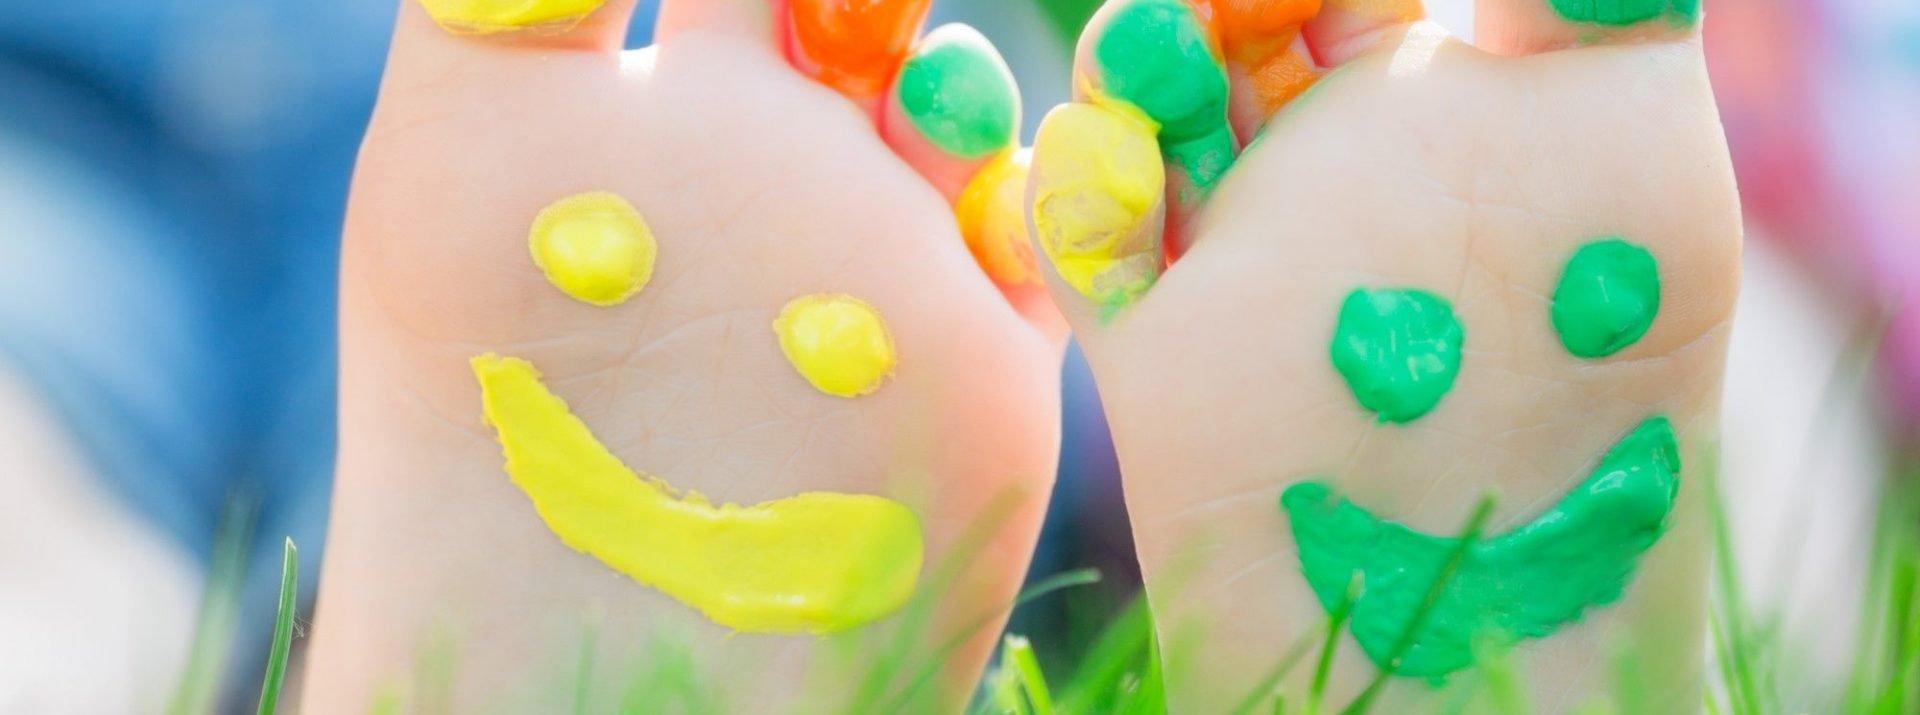 Children's Foot Health